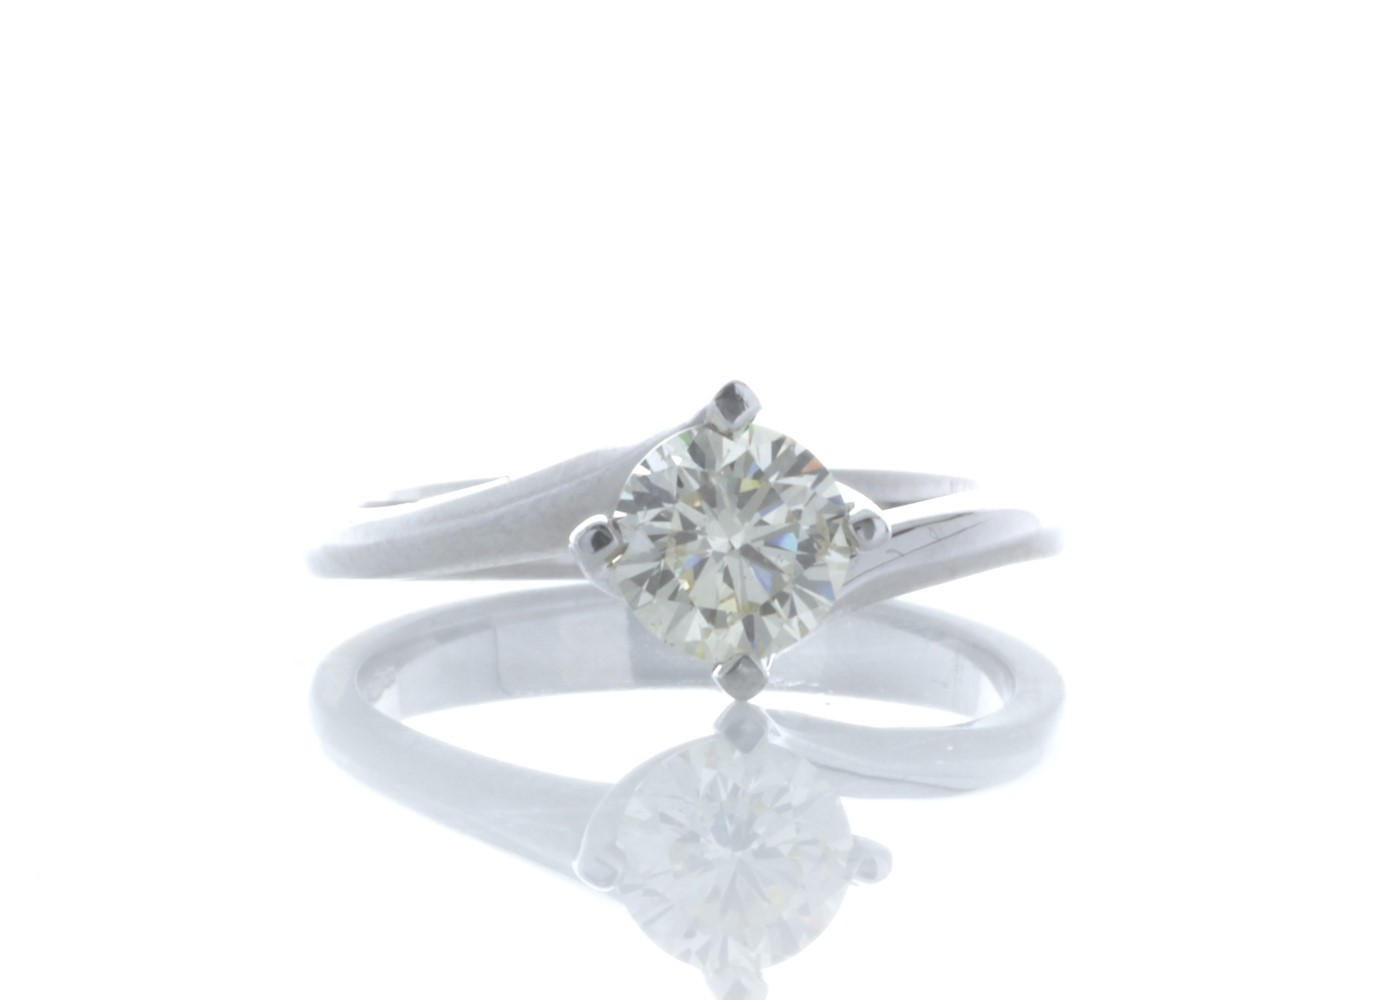 Lot 14 - 18ct White Gold Single Stone Fancy Claw Set Diamond Ring 0.71 Carats